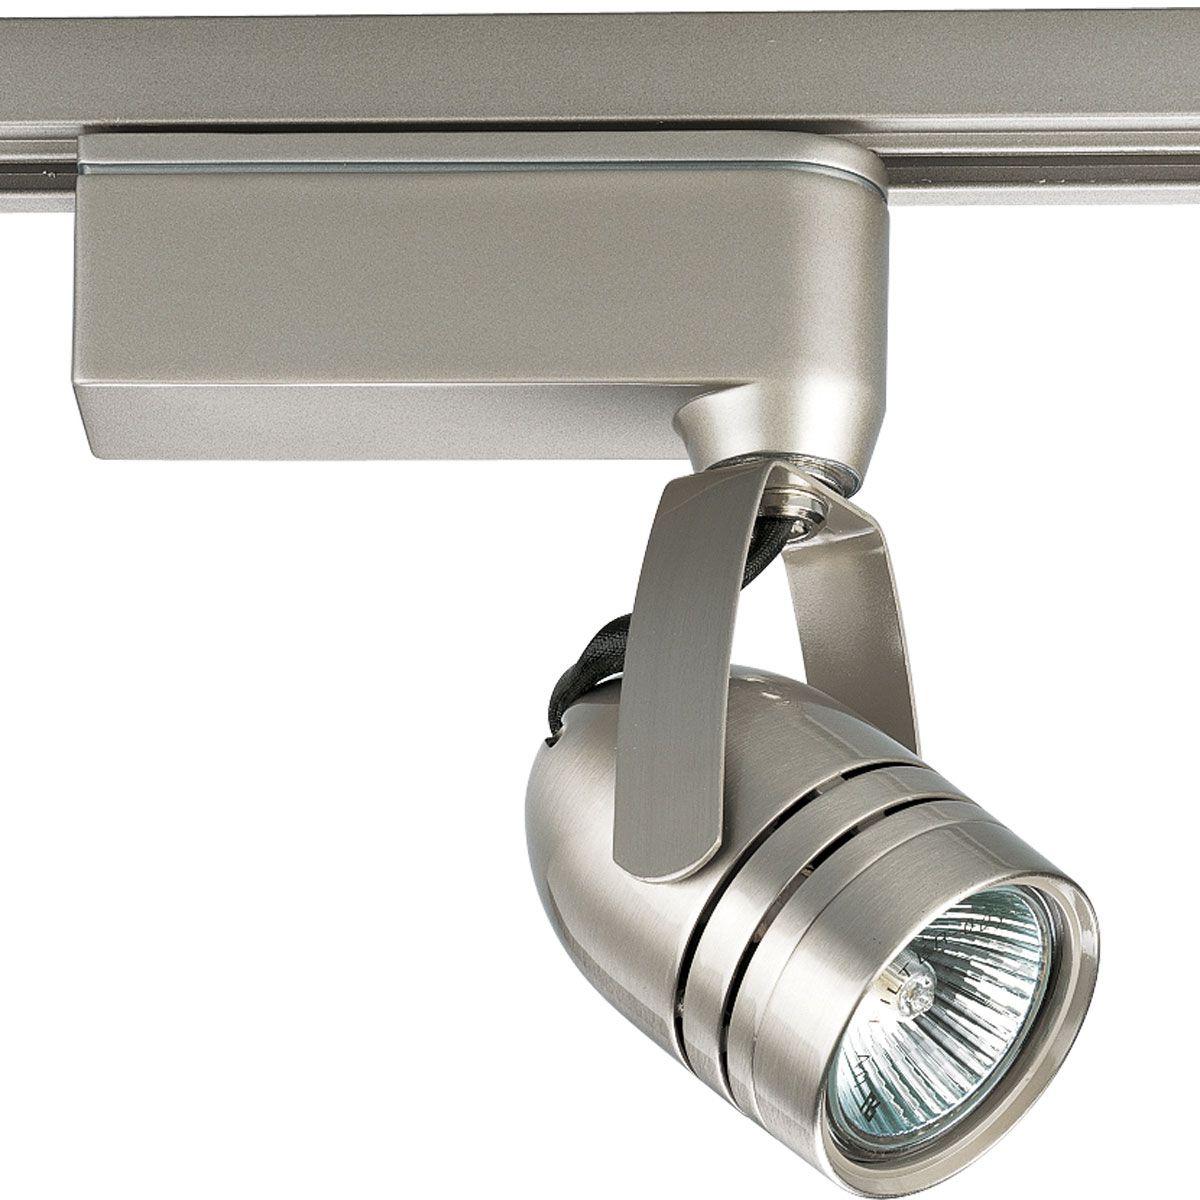 Low Voltage Indoor Lighting Systems: Alpha Trak Low Voltage MR16 Track Head